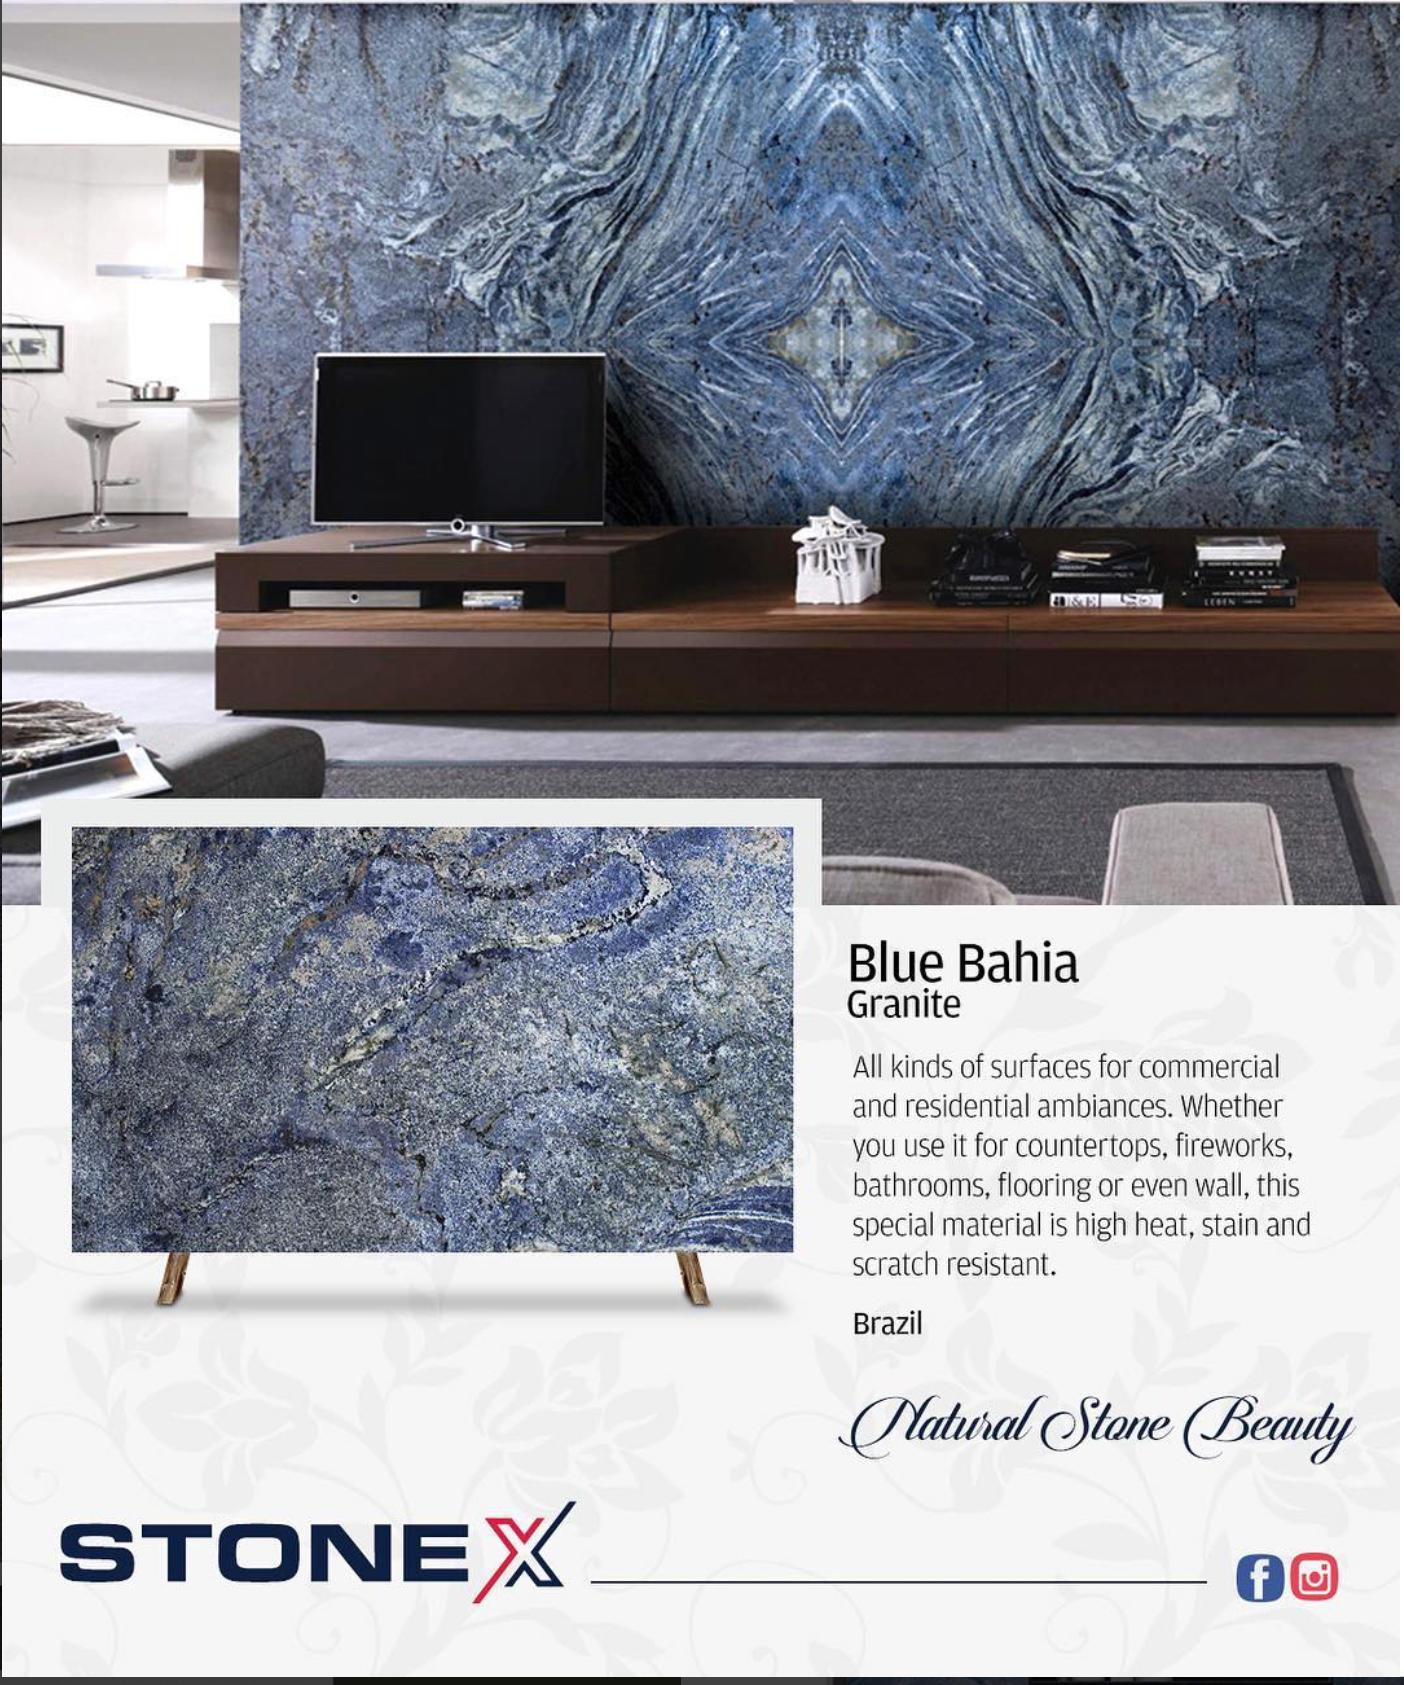 STONEX USA SUPPLIER OF GRANITE & QUARTZ & TILE image 1